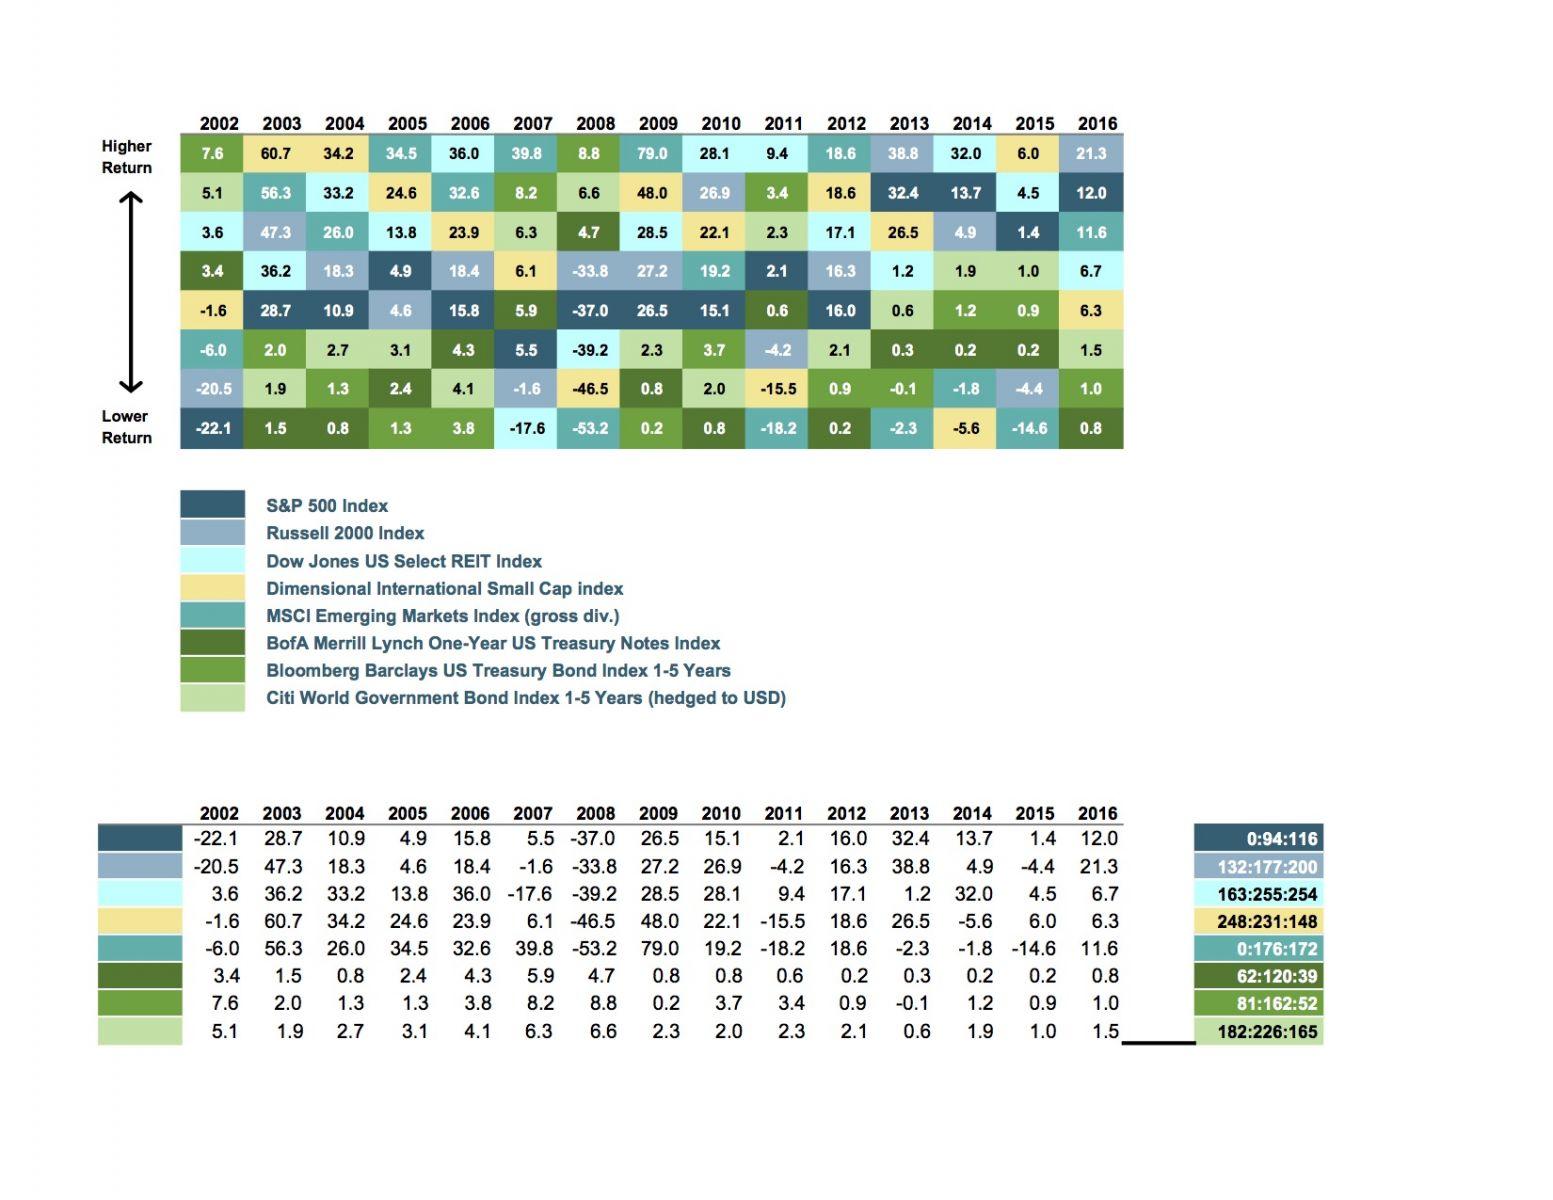 investors,risk,finance,investment